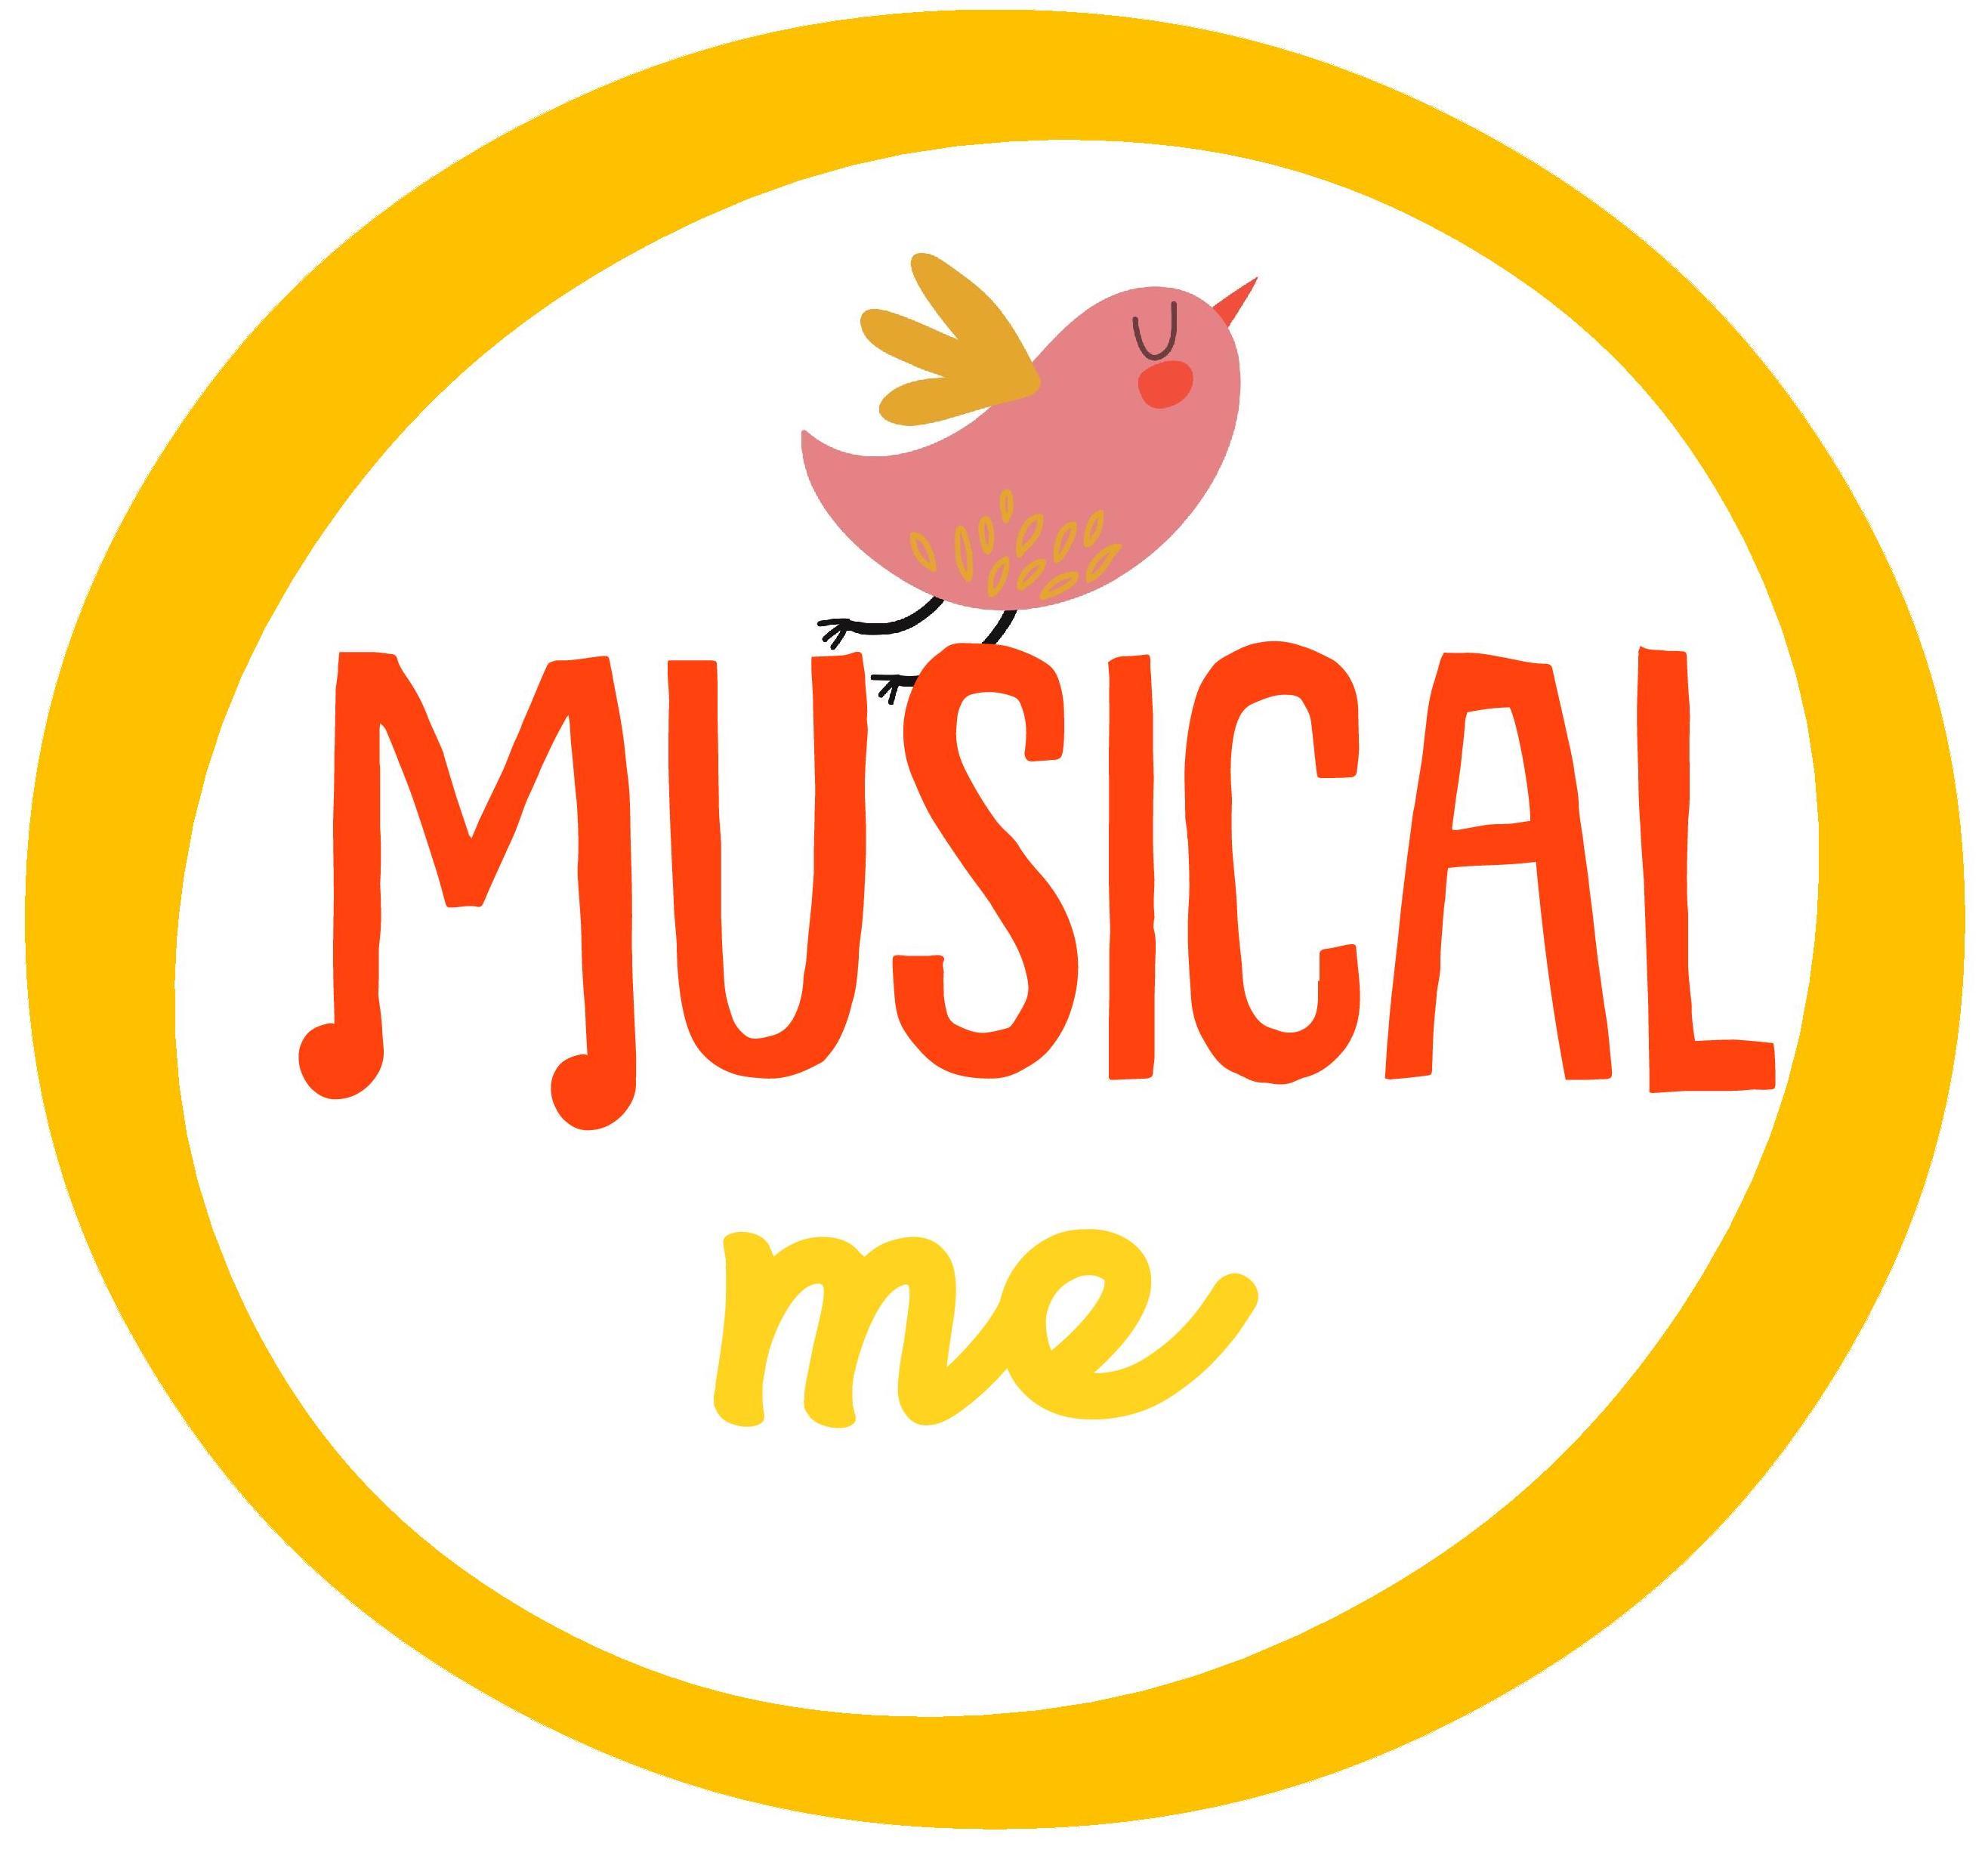 Musical Me's logo